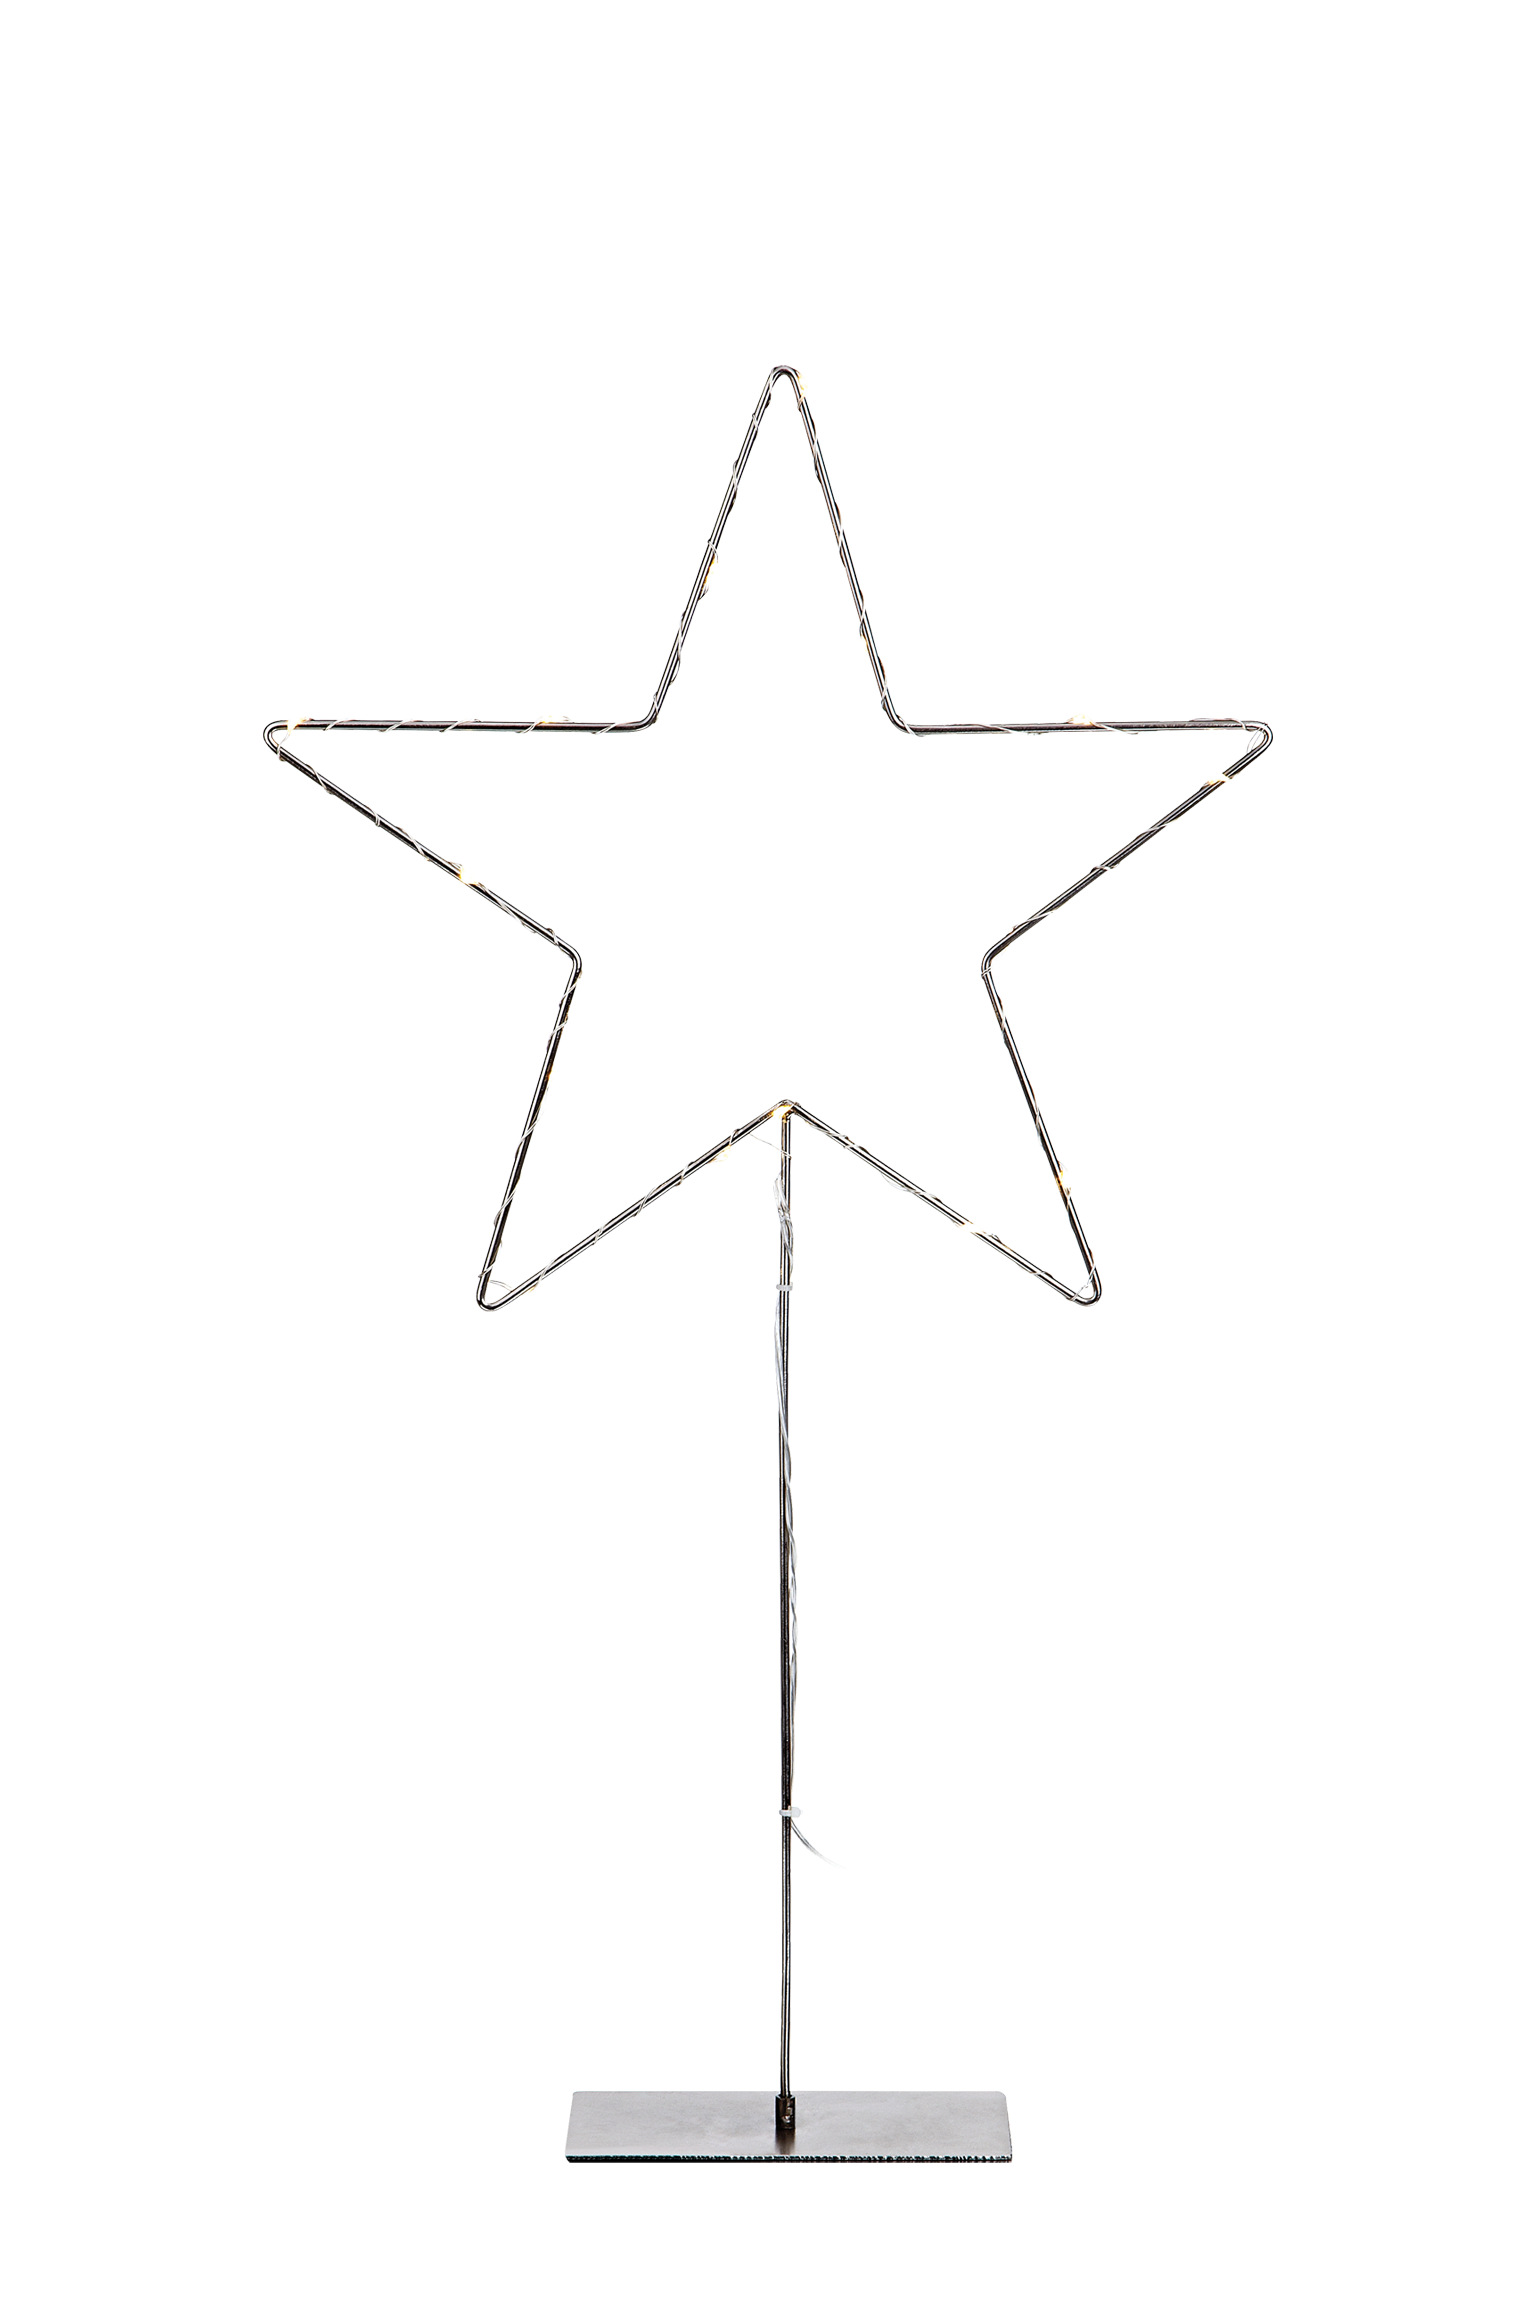 BJÖRKGÅRDEN - Star steel